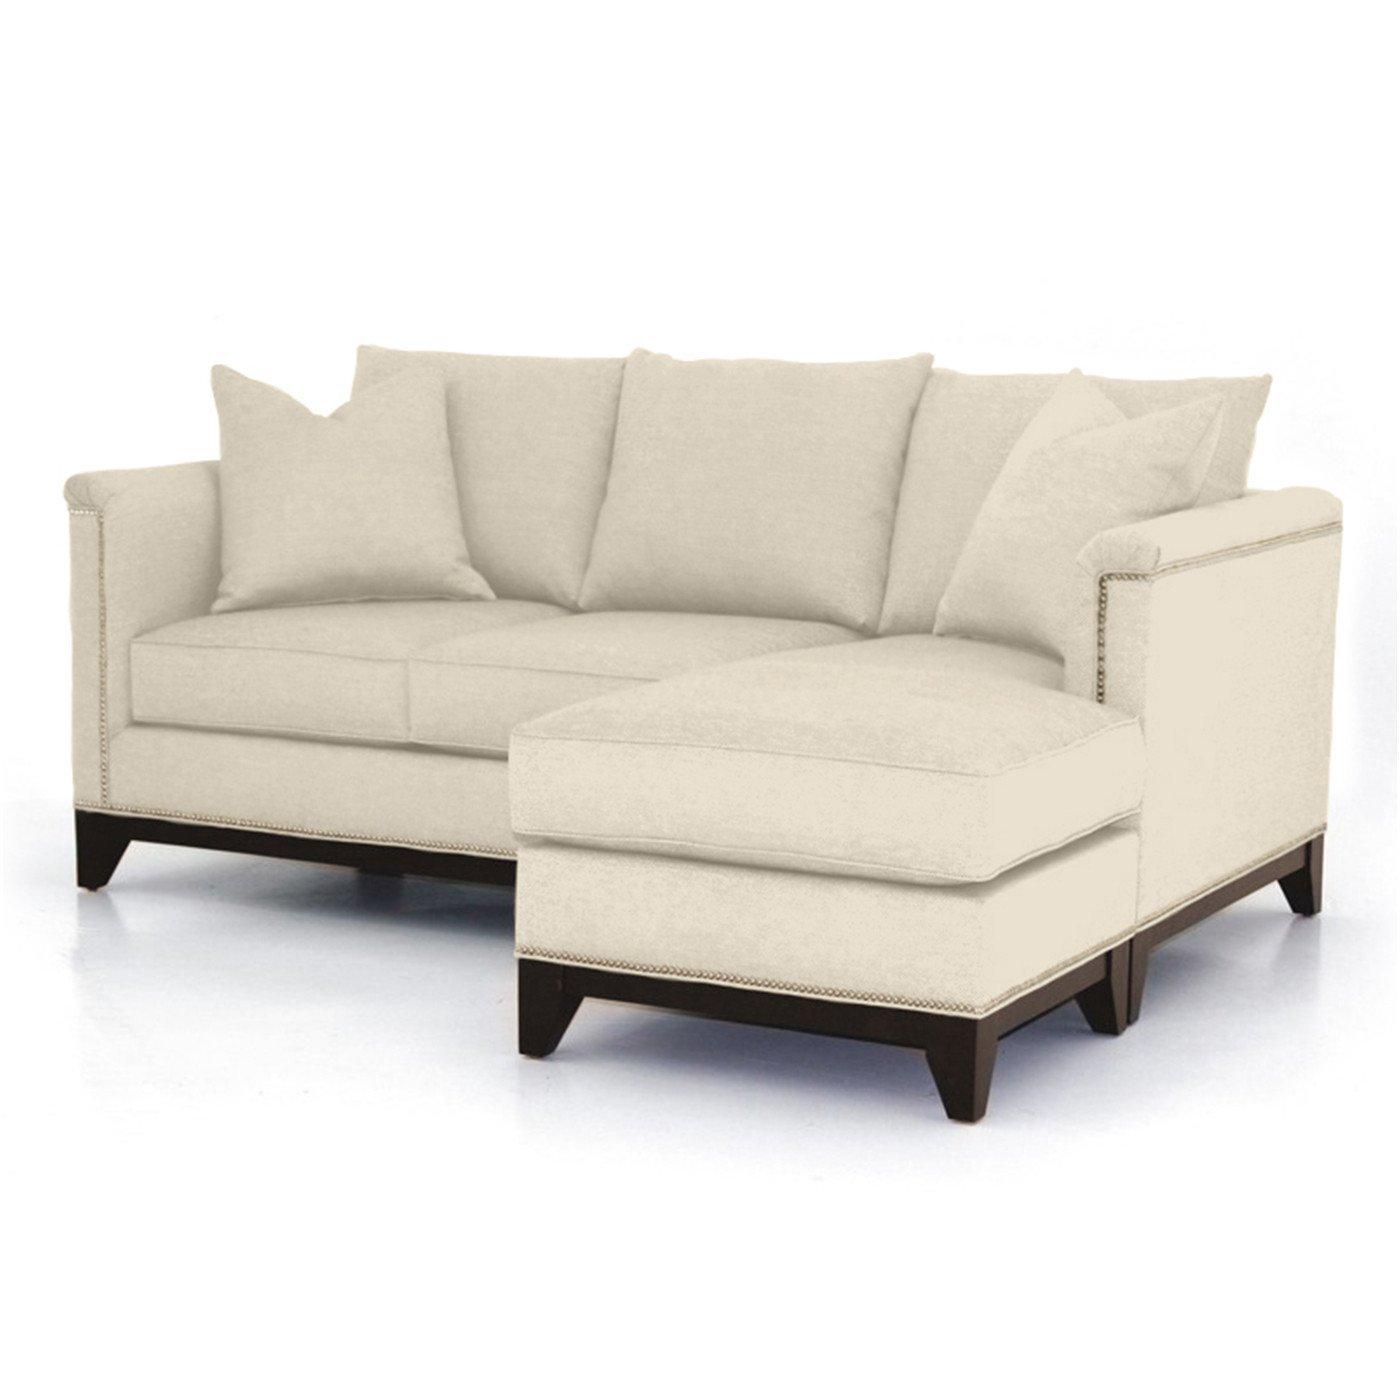 Amazon.com: La Brea Reversible Chaise Sofa, Buckwheat ...